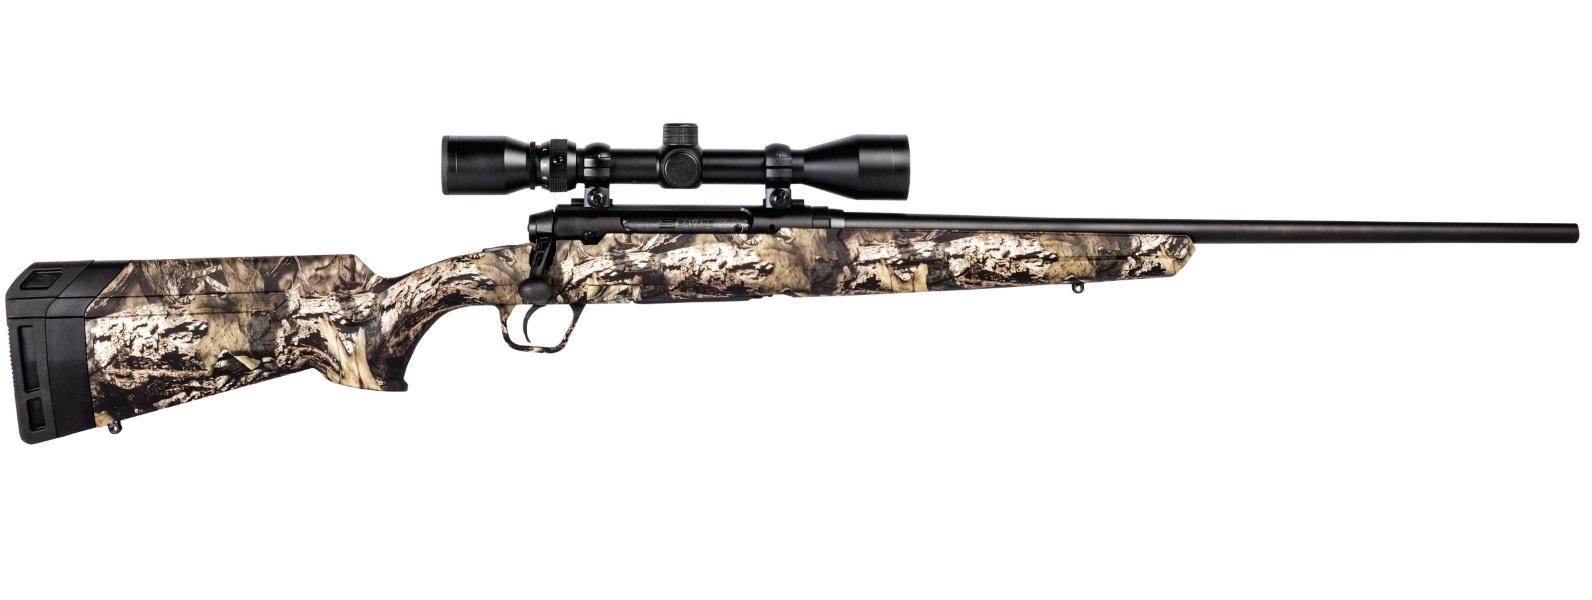 Savage Arms Axis XP Camo 6.5 Creedmoor